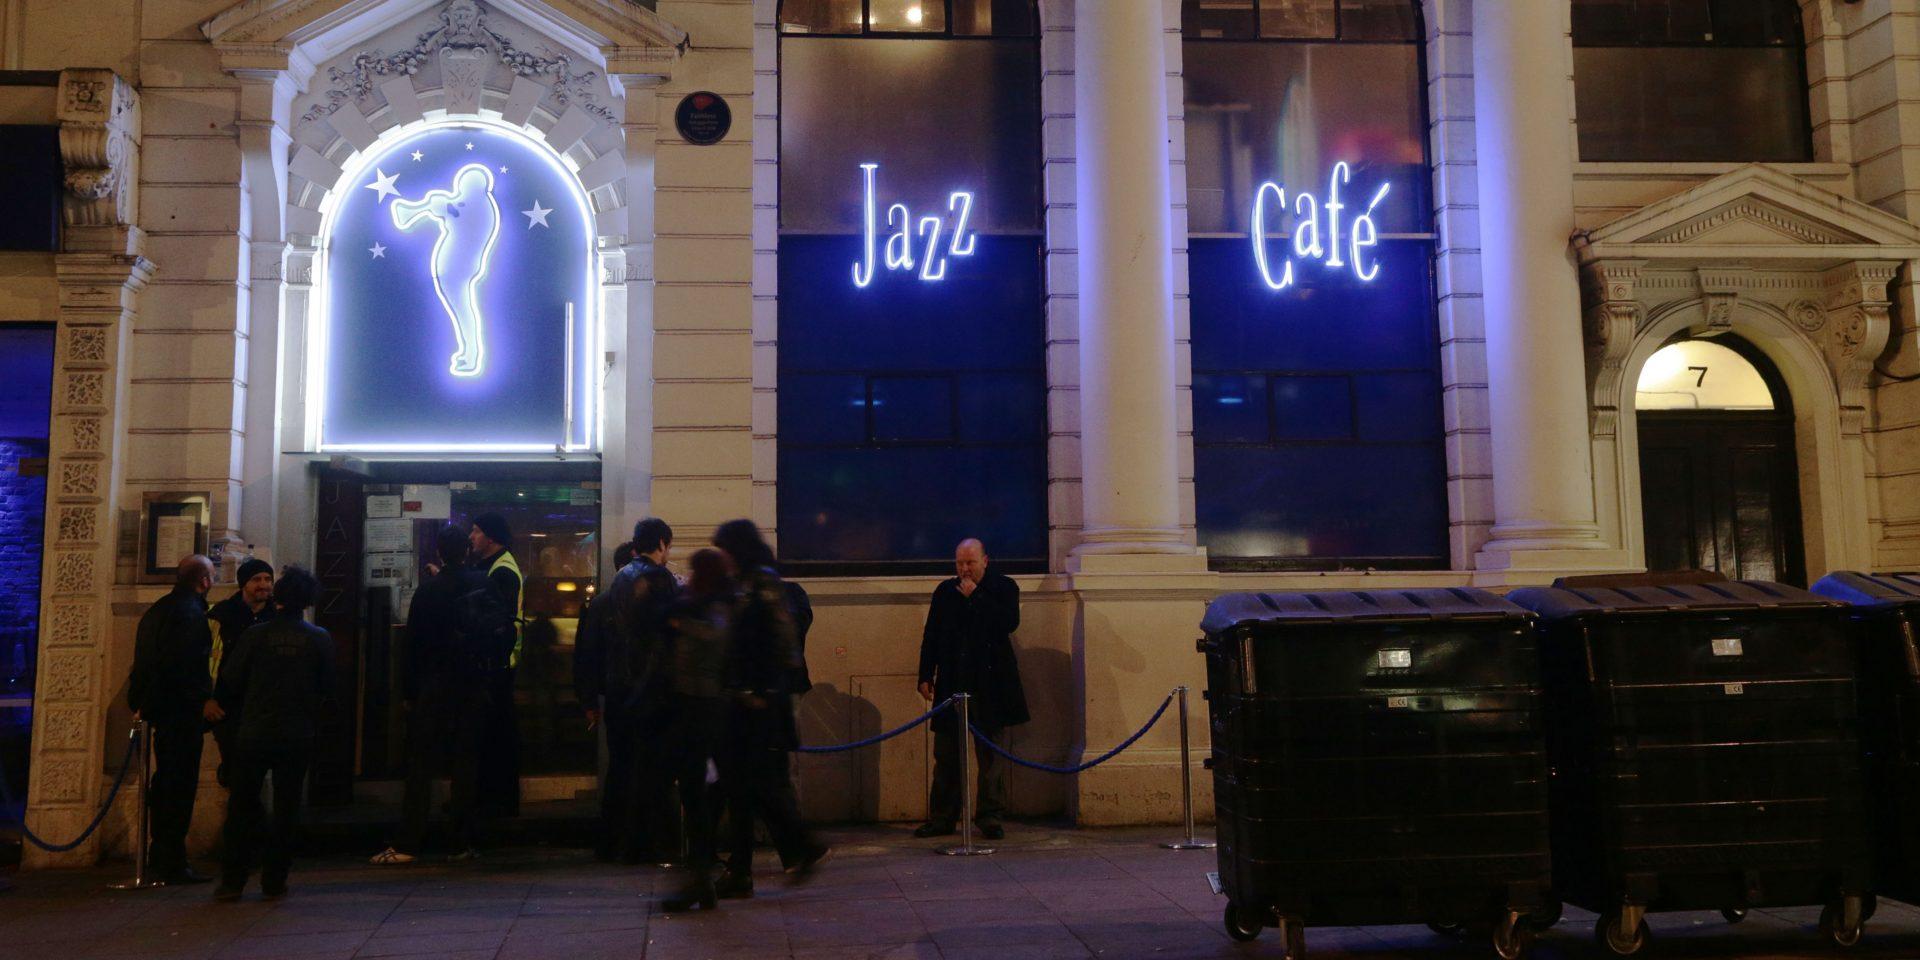 The Jazz Cafe Improvs a Return